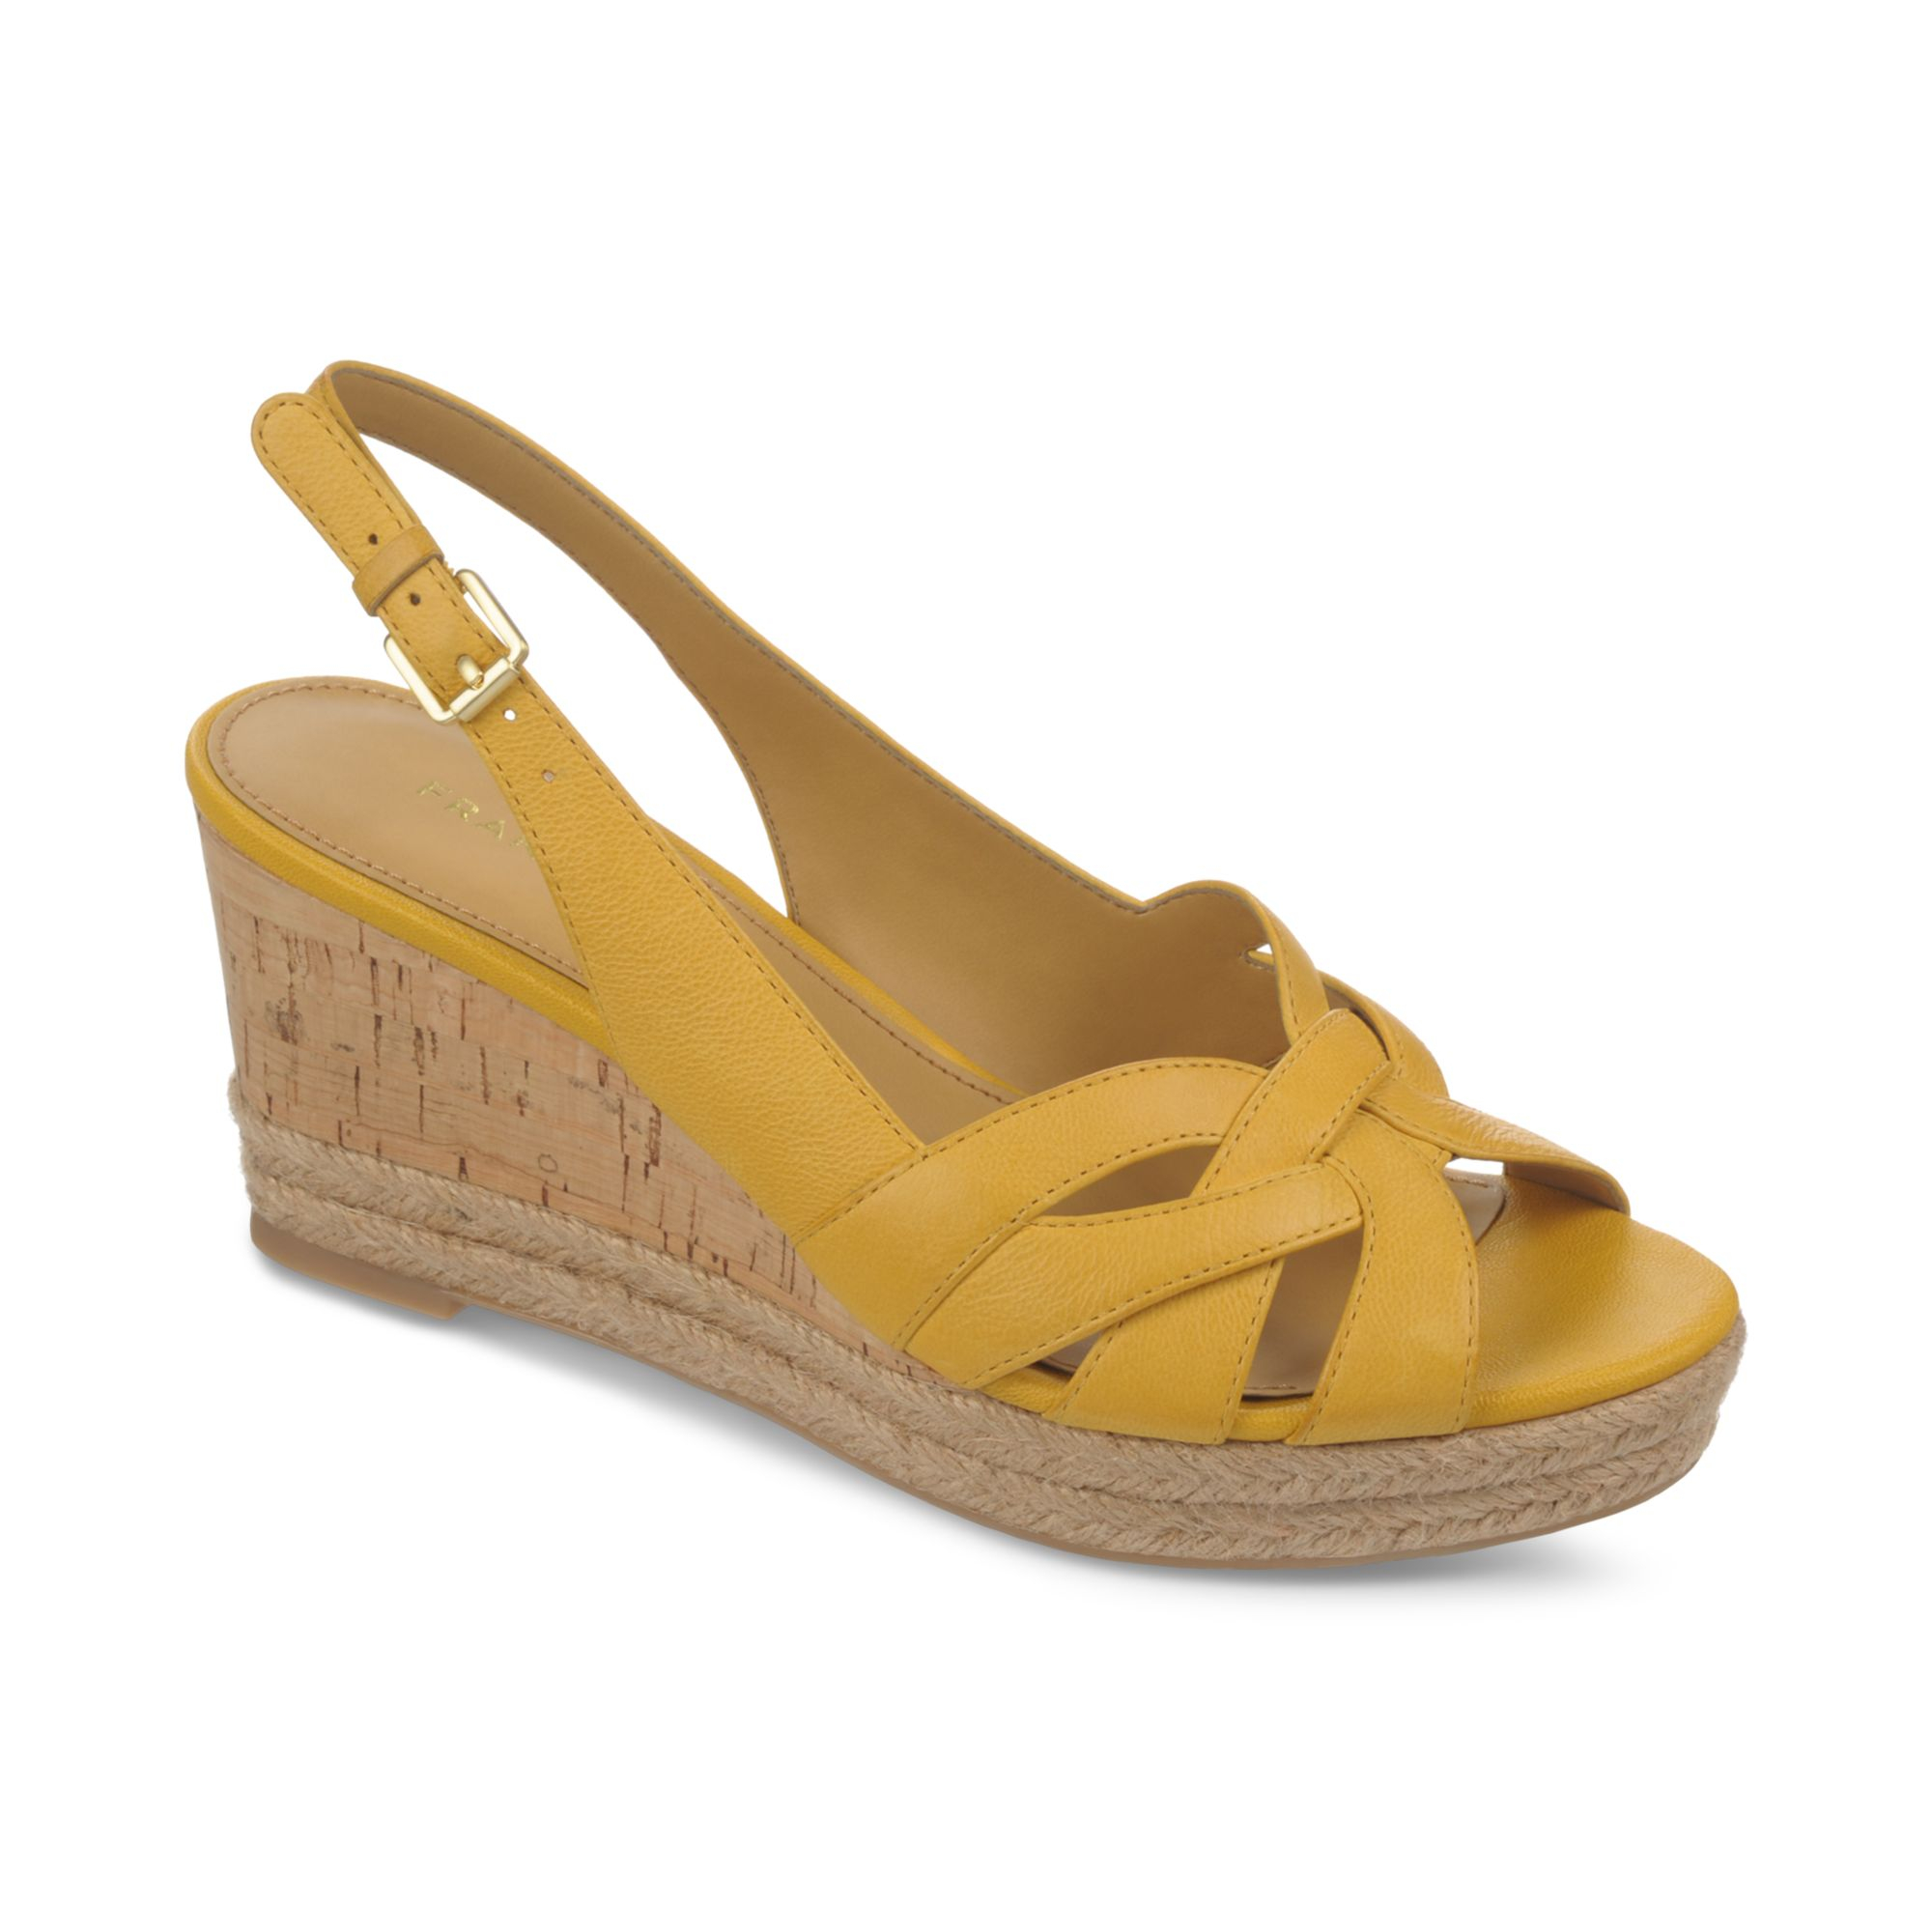 Franco Sarto Kris Platform Wedge Espadrille Sandals In